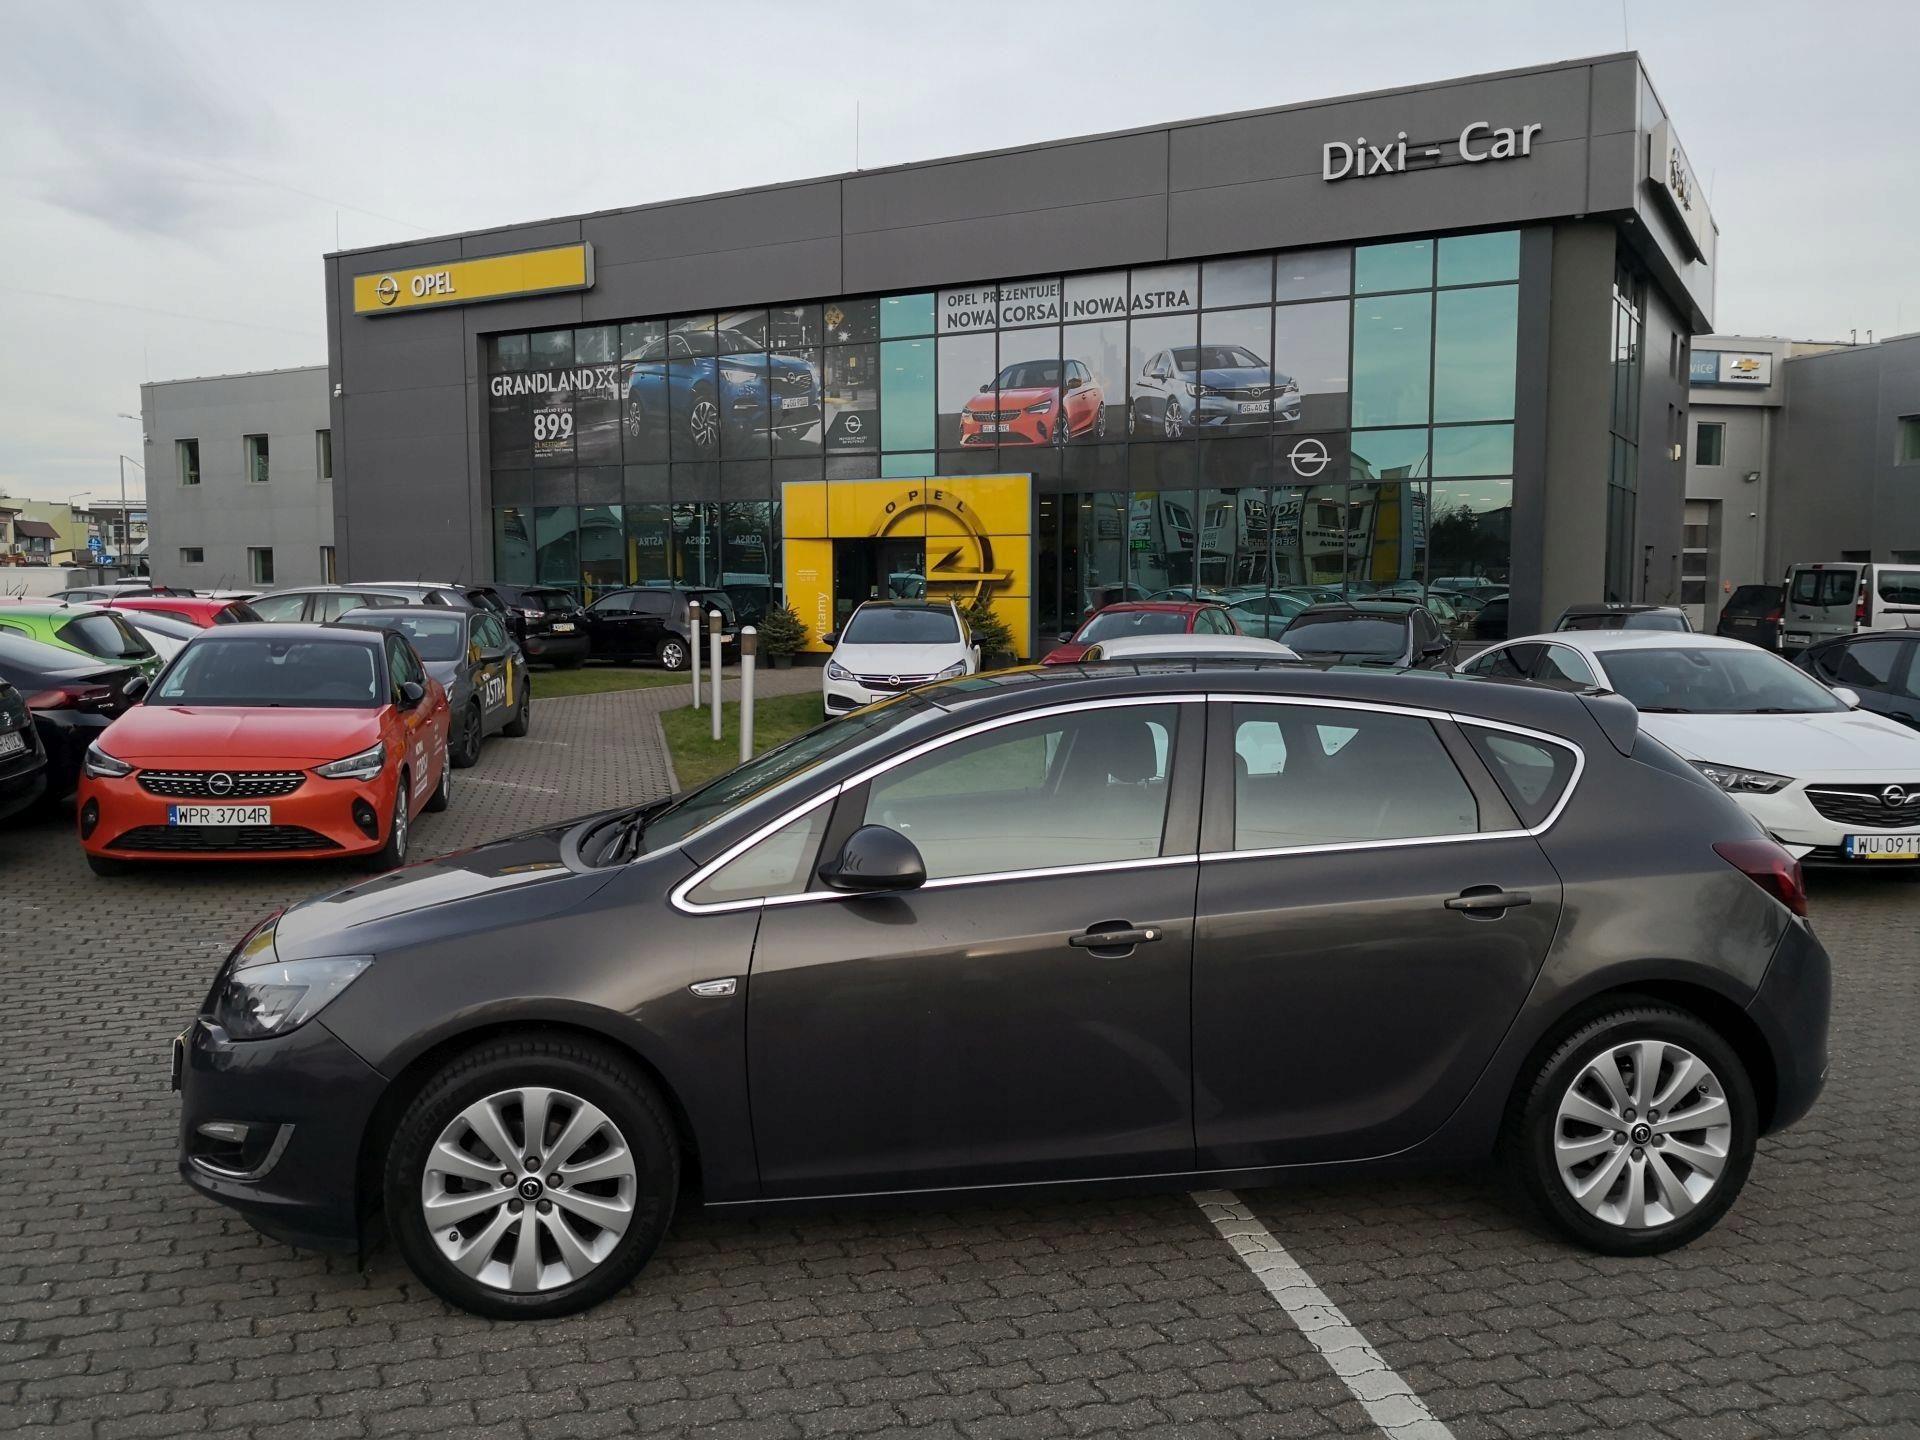 Фото Opel Astra OPC - фотографии, фото салона Opel Astra OPC, J ... | 1440x1920